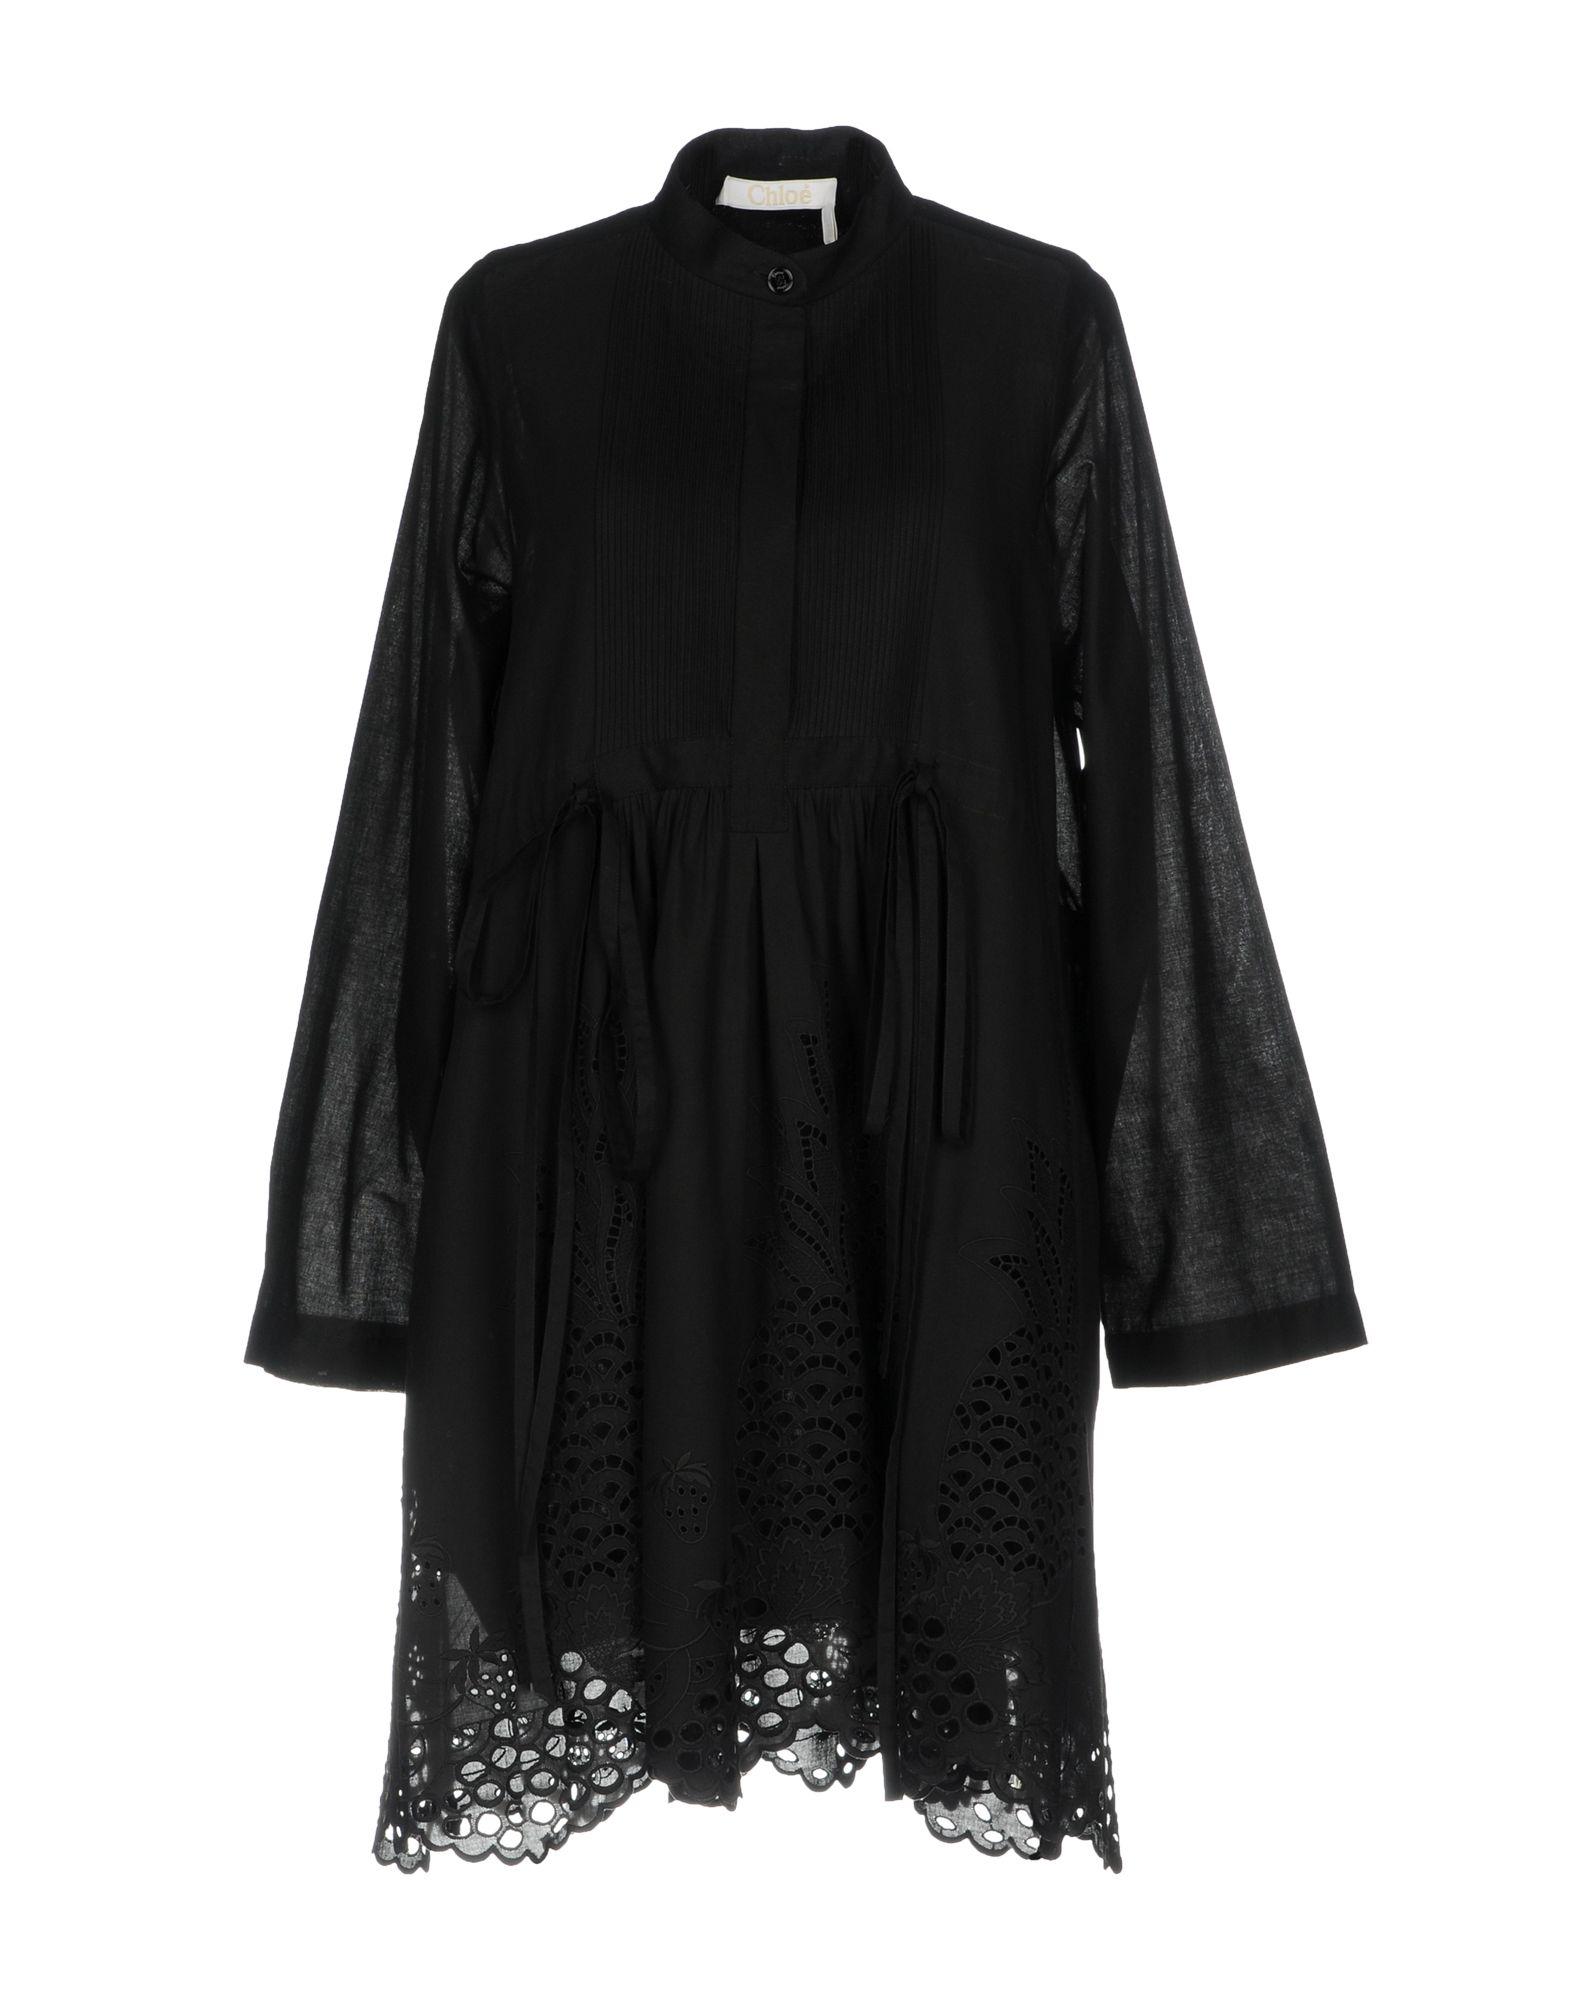 ФОТО chloé короткое платье